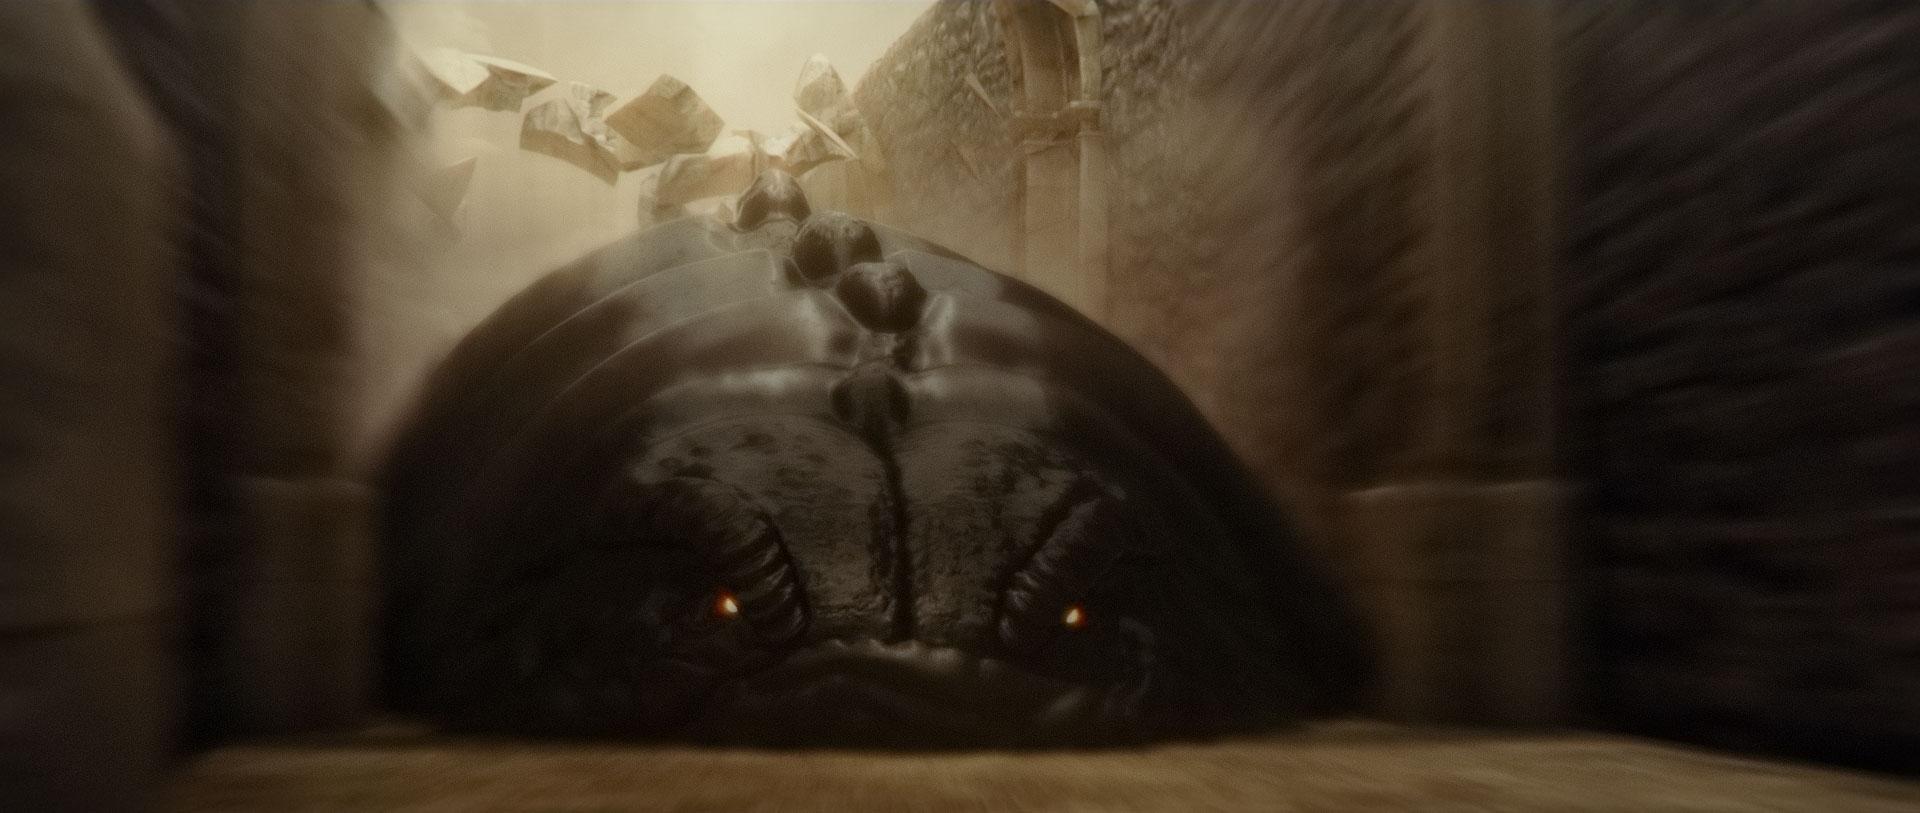 Kune-cortometraje-monstruo